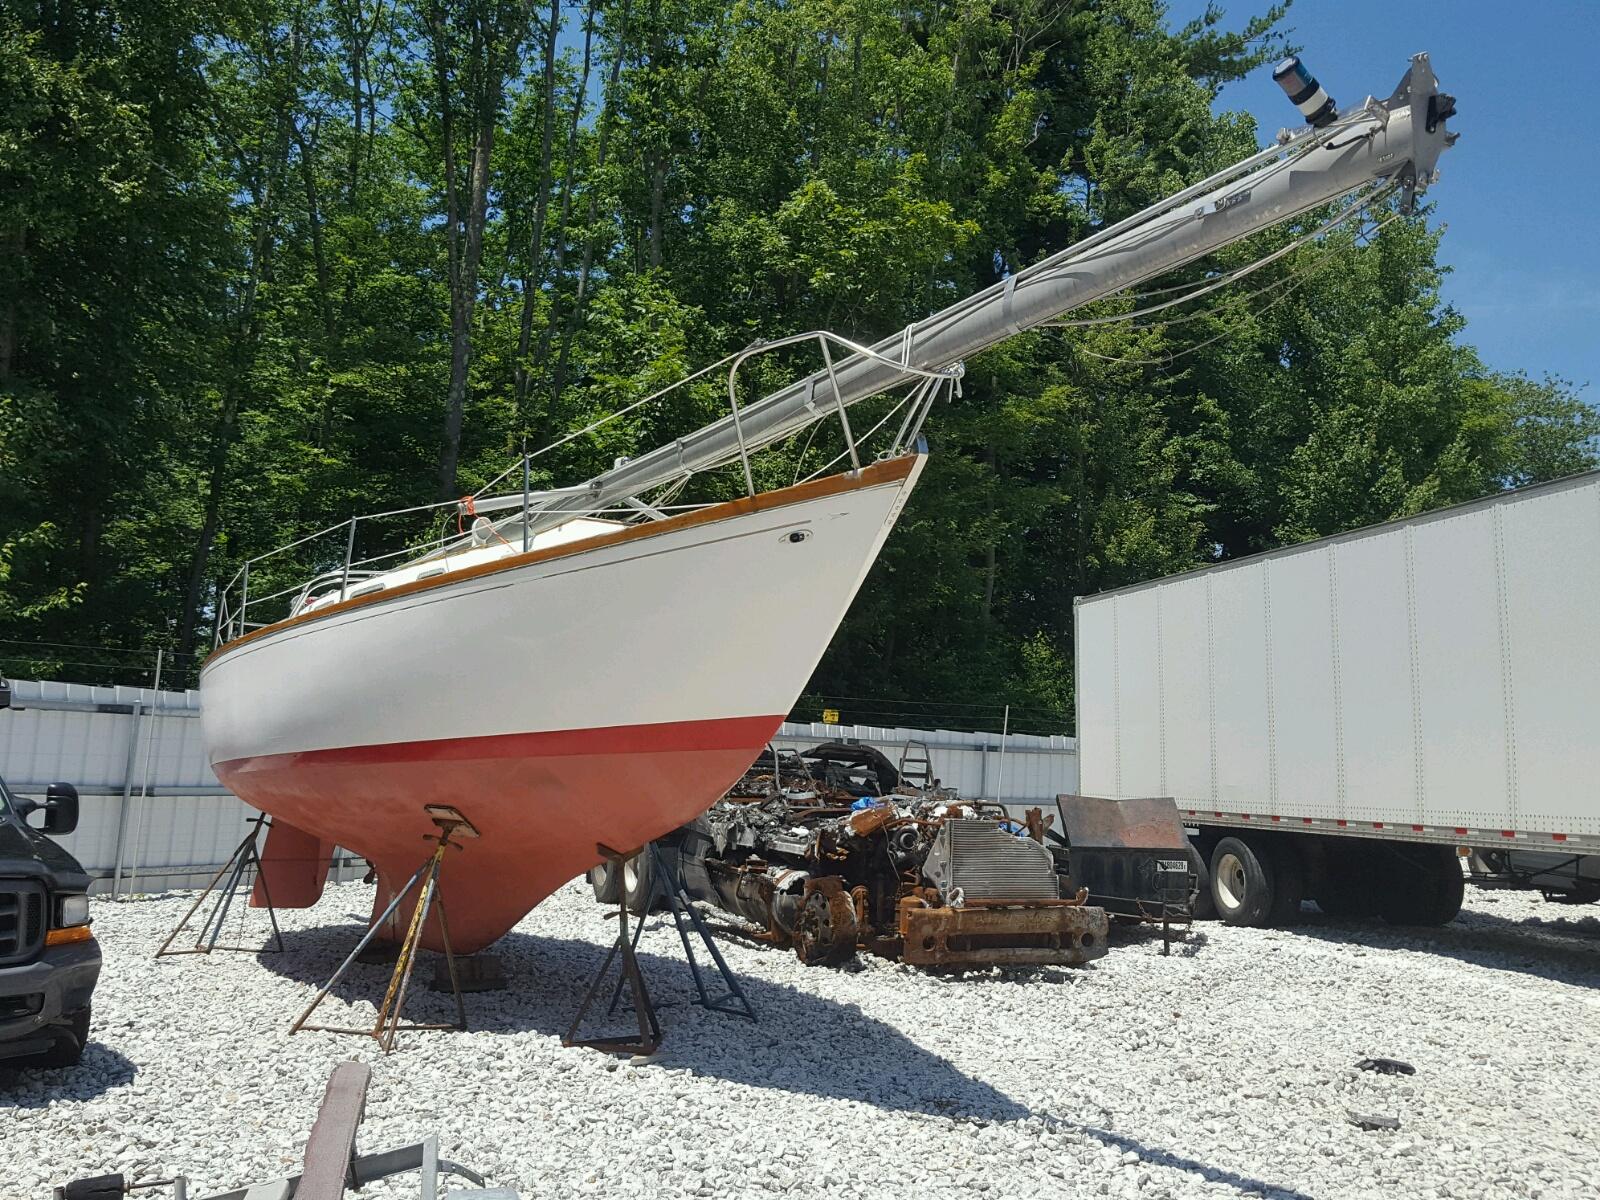 Salvage 1972 Sail TARTAN for sale